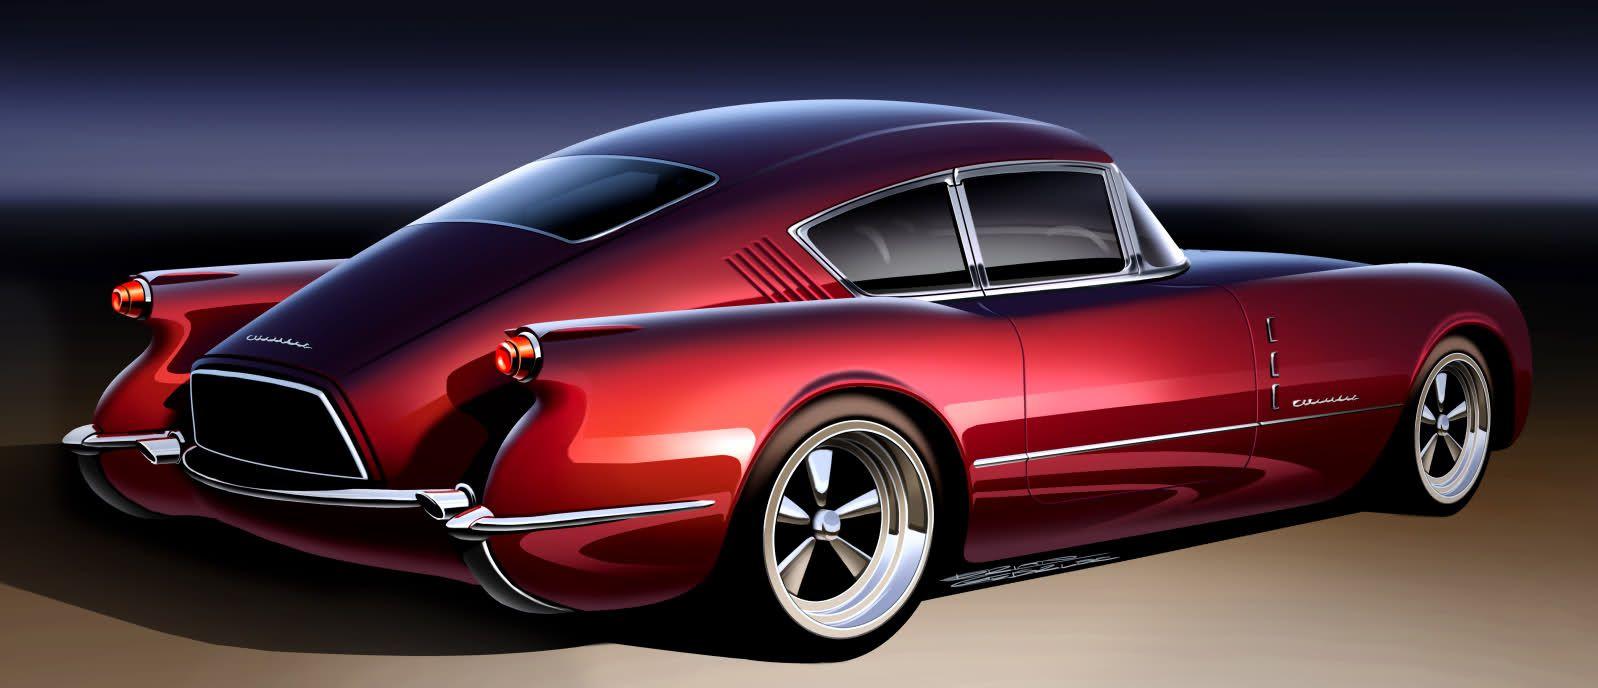 The Return Of The 1954 Autorama Corvette Kit Cars Retro Cars Chevrolet Corvair